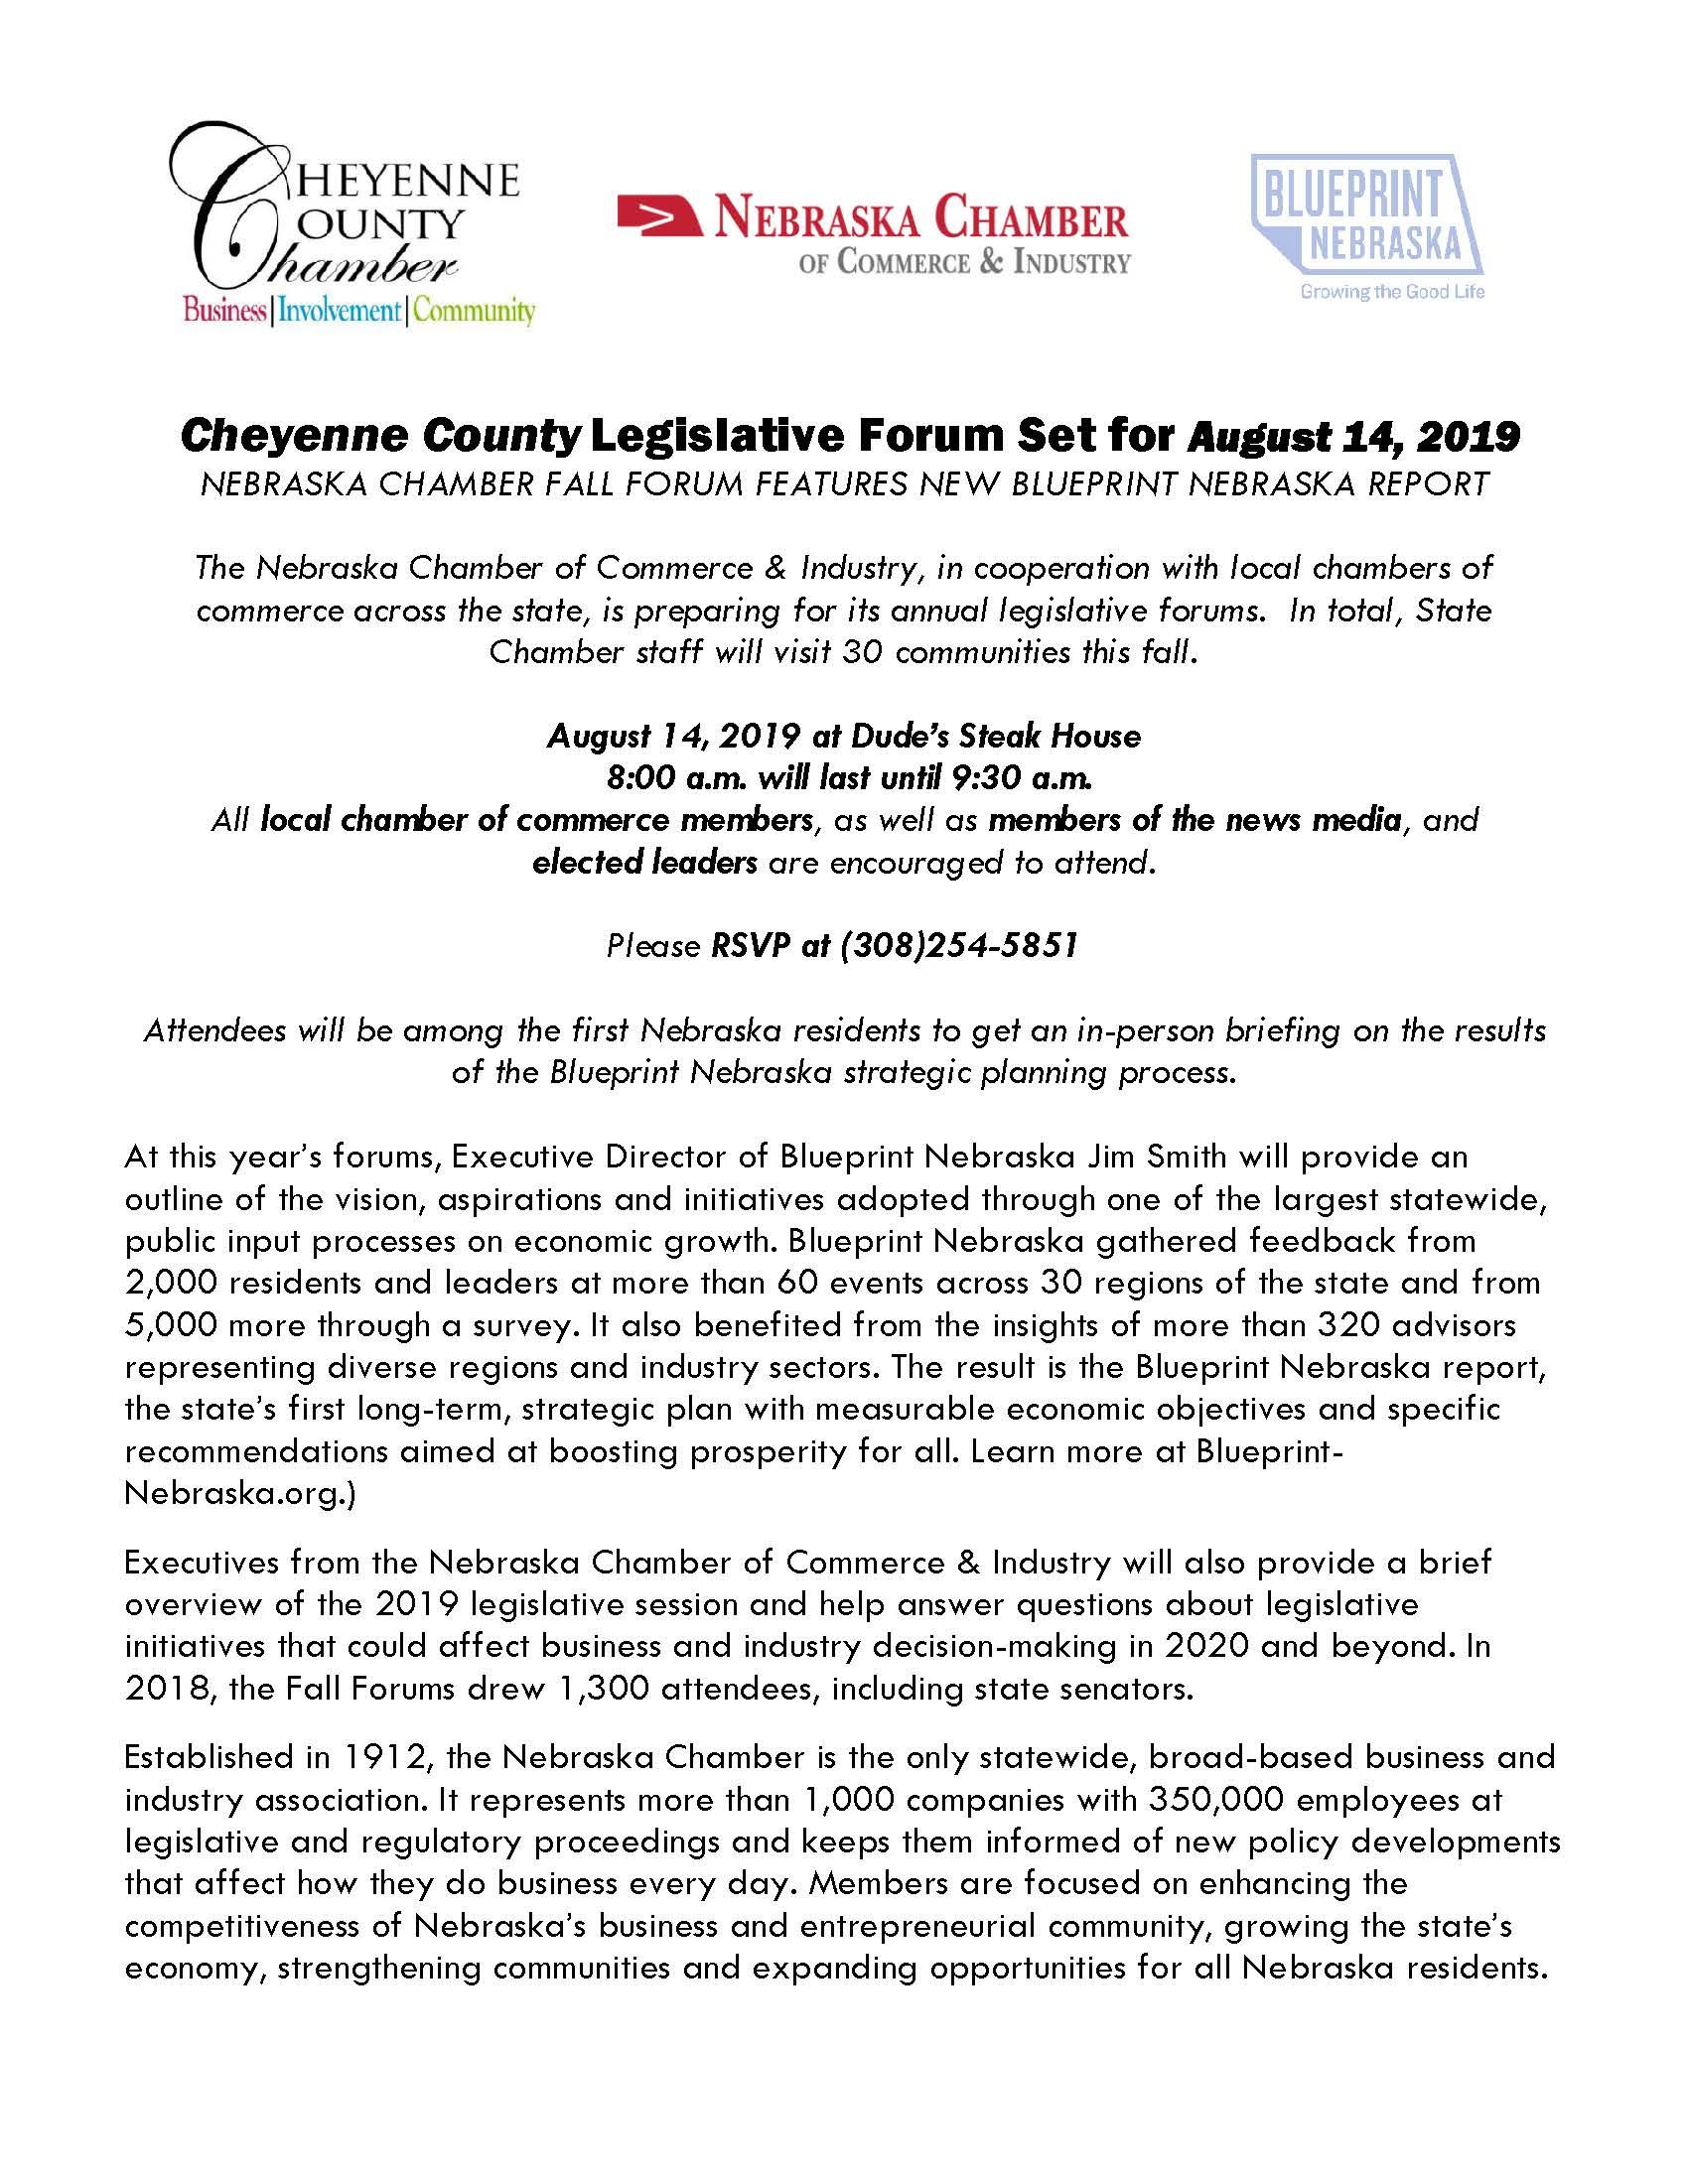 Cheyenne-County-Legislative-Forum-Set-for-August-14_nl-announcement_invite.jpg